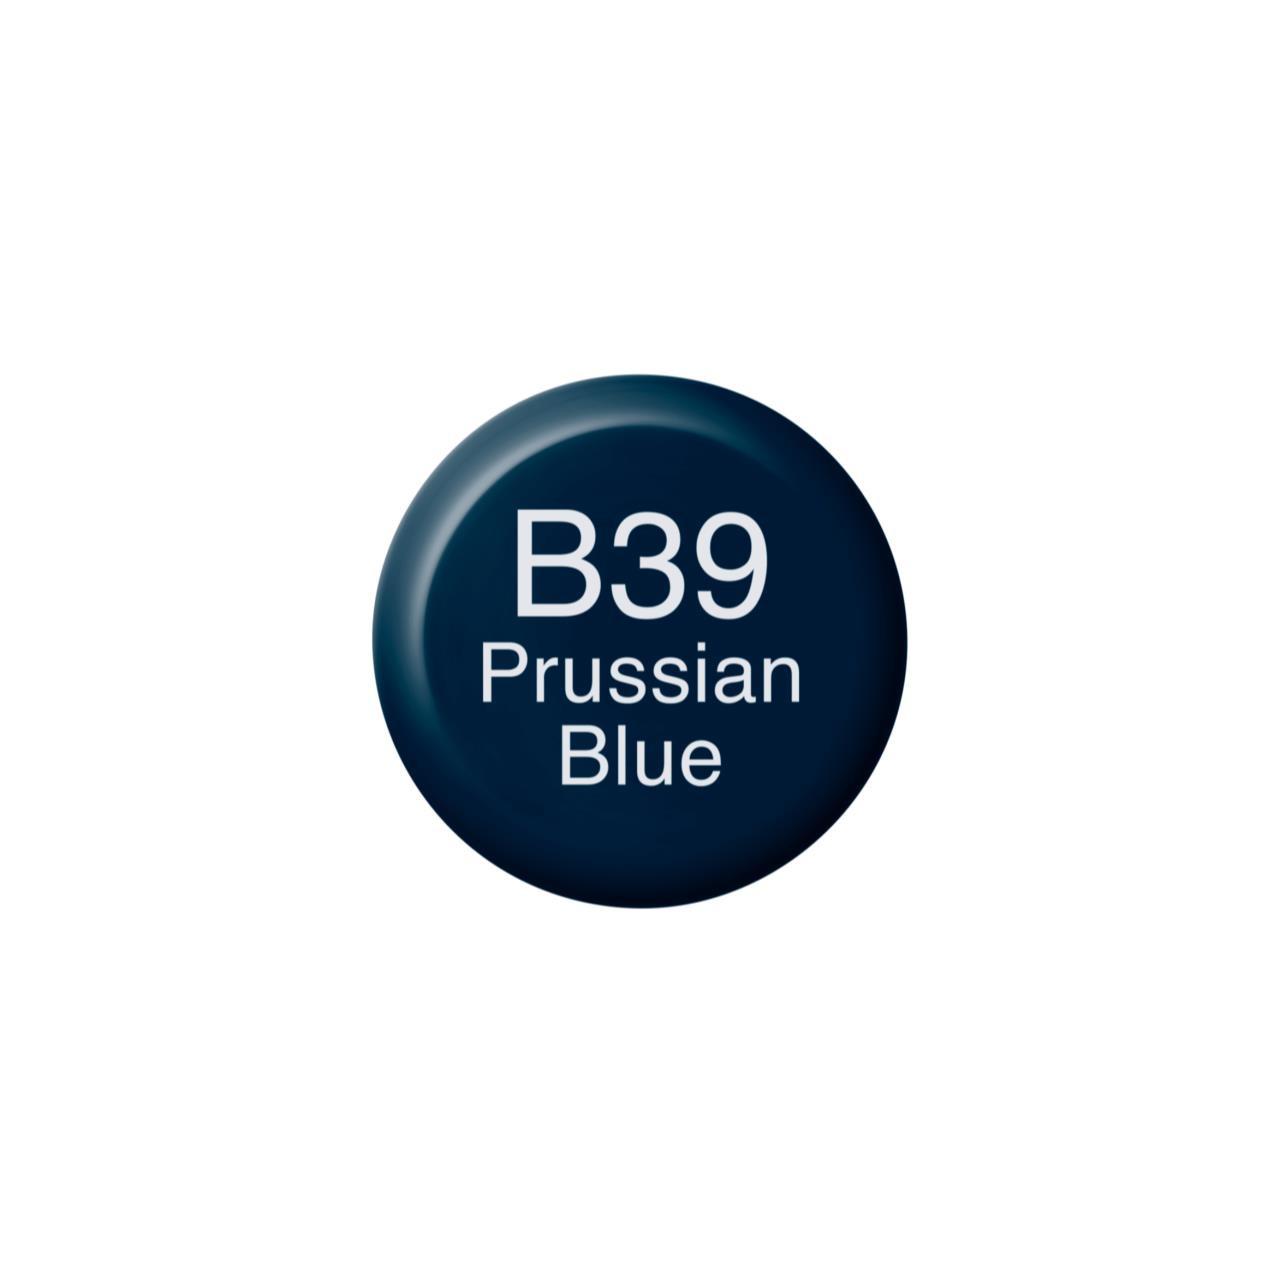 B39 Prussian Blue, Copic Ink - 4511338056011